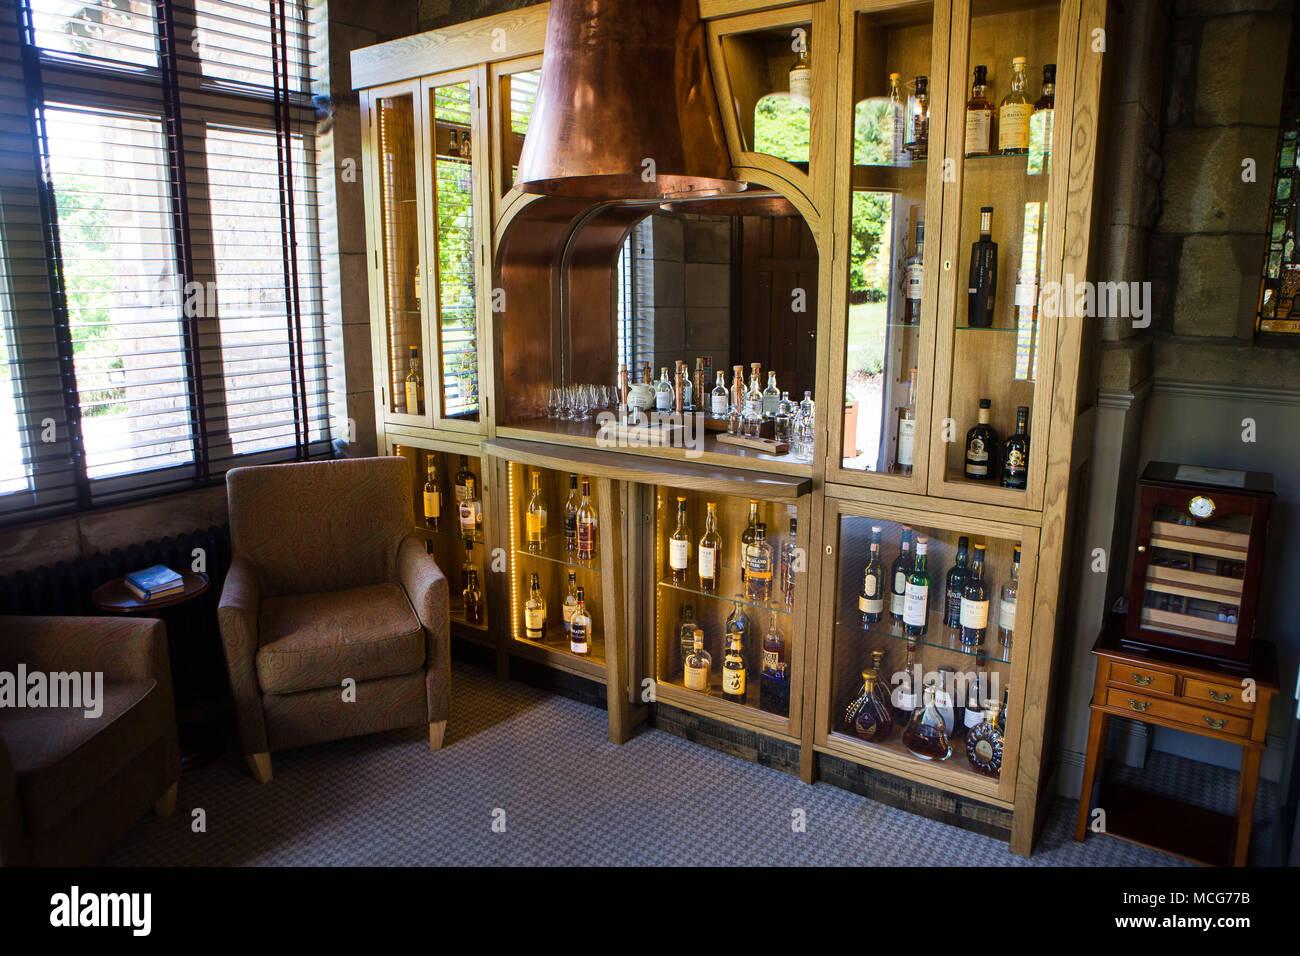 Whisky Bar Stock Photos & Whisky Bar Stock Images - Alamy